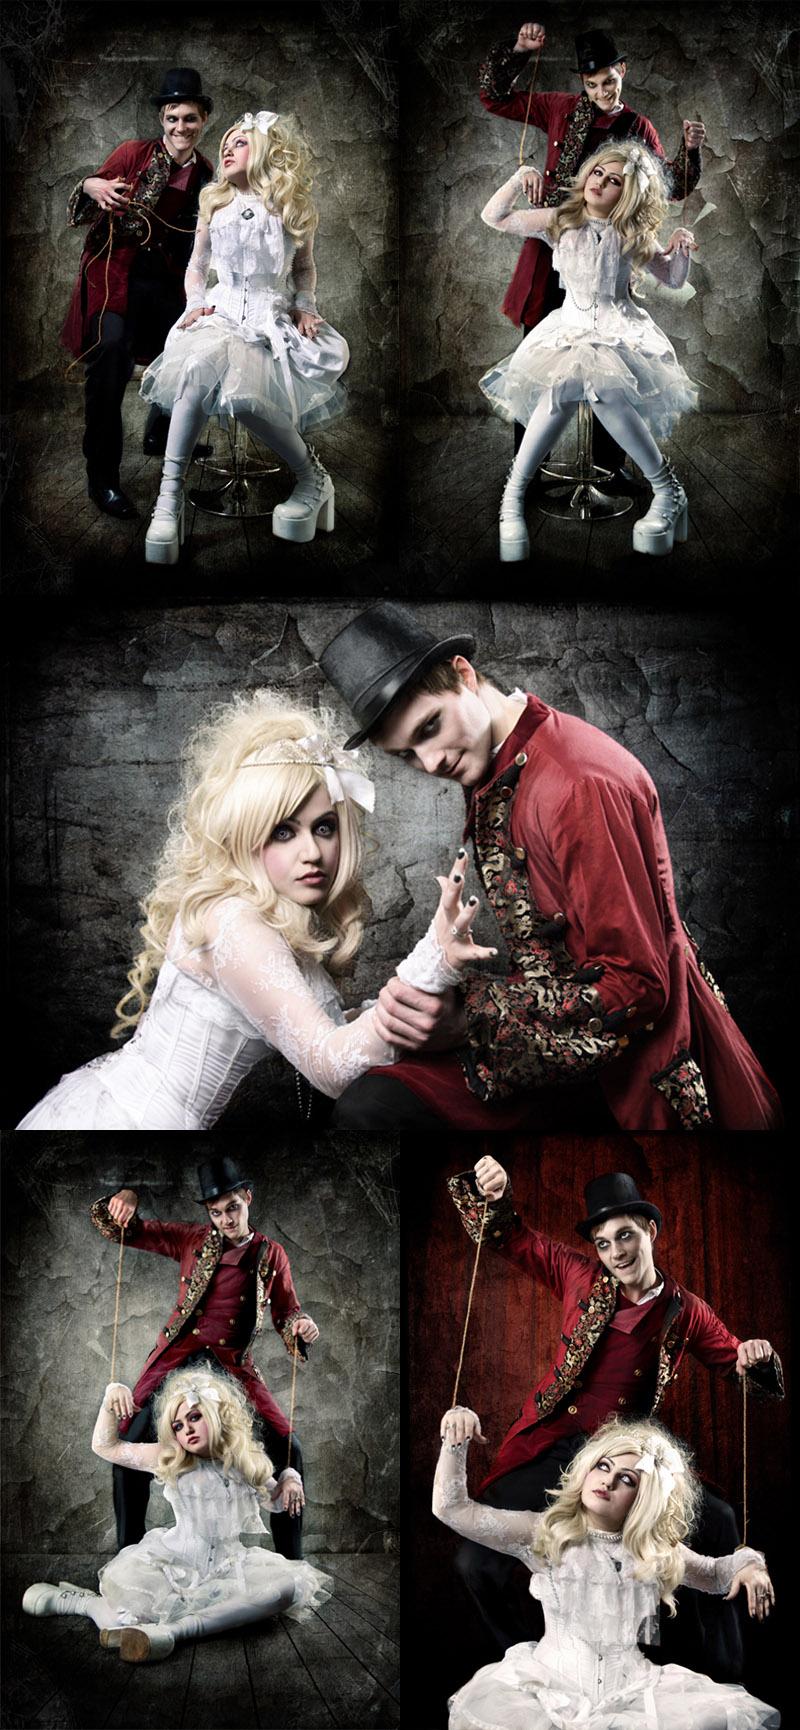 London/Studio May 24, 2009 Taya Uddin/ EyeXposed Photography Master of Puppets